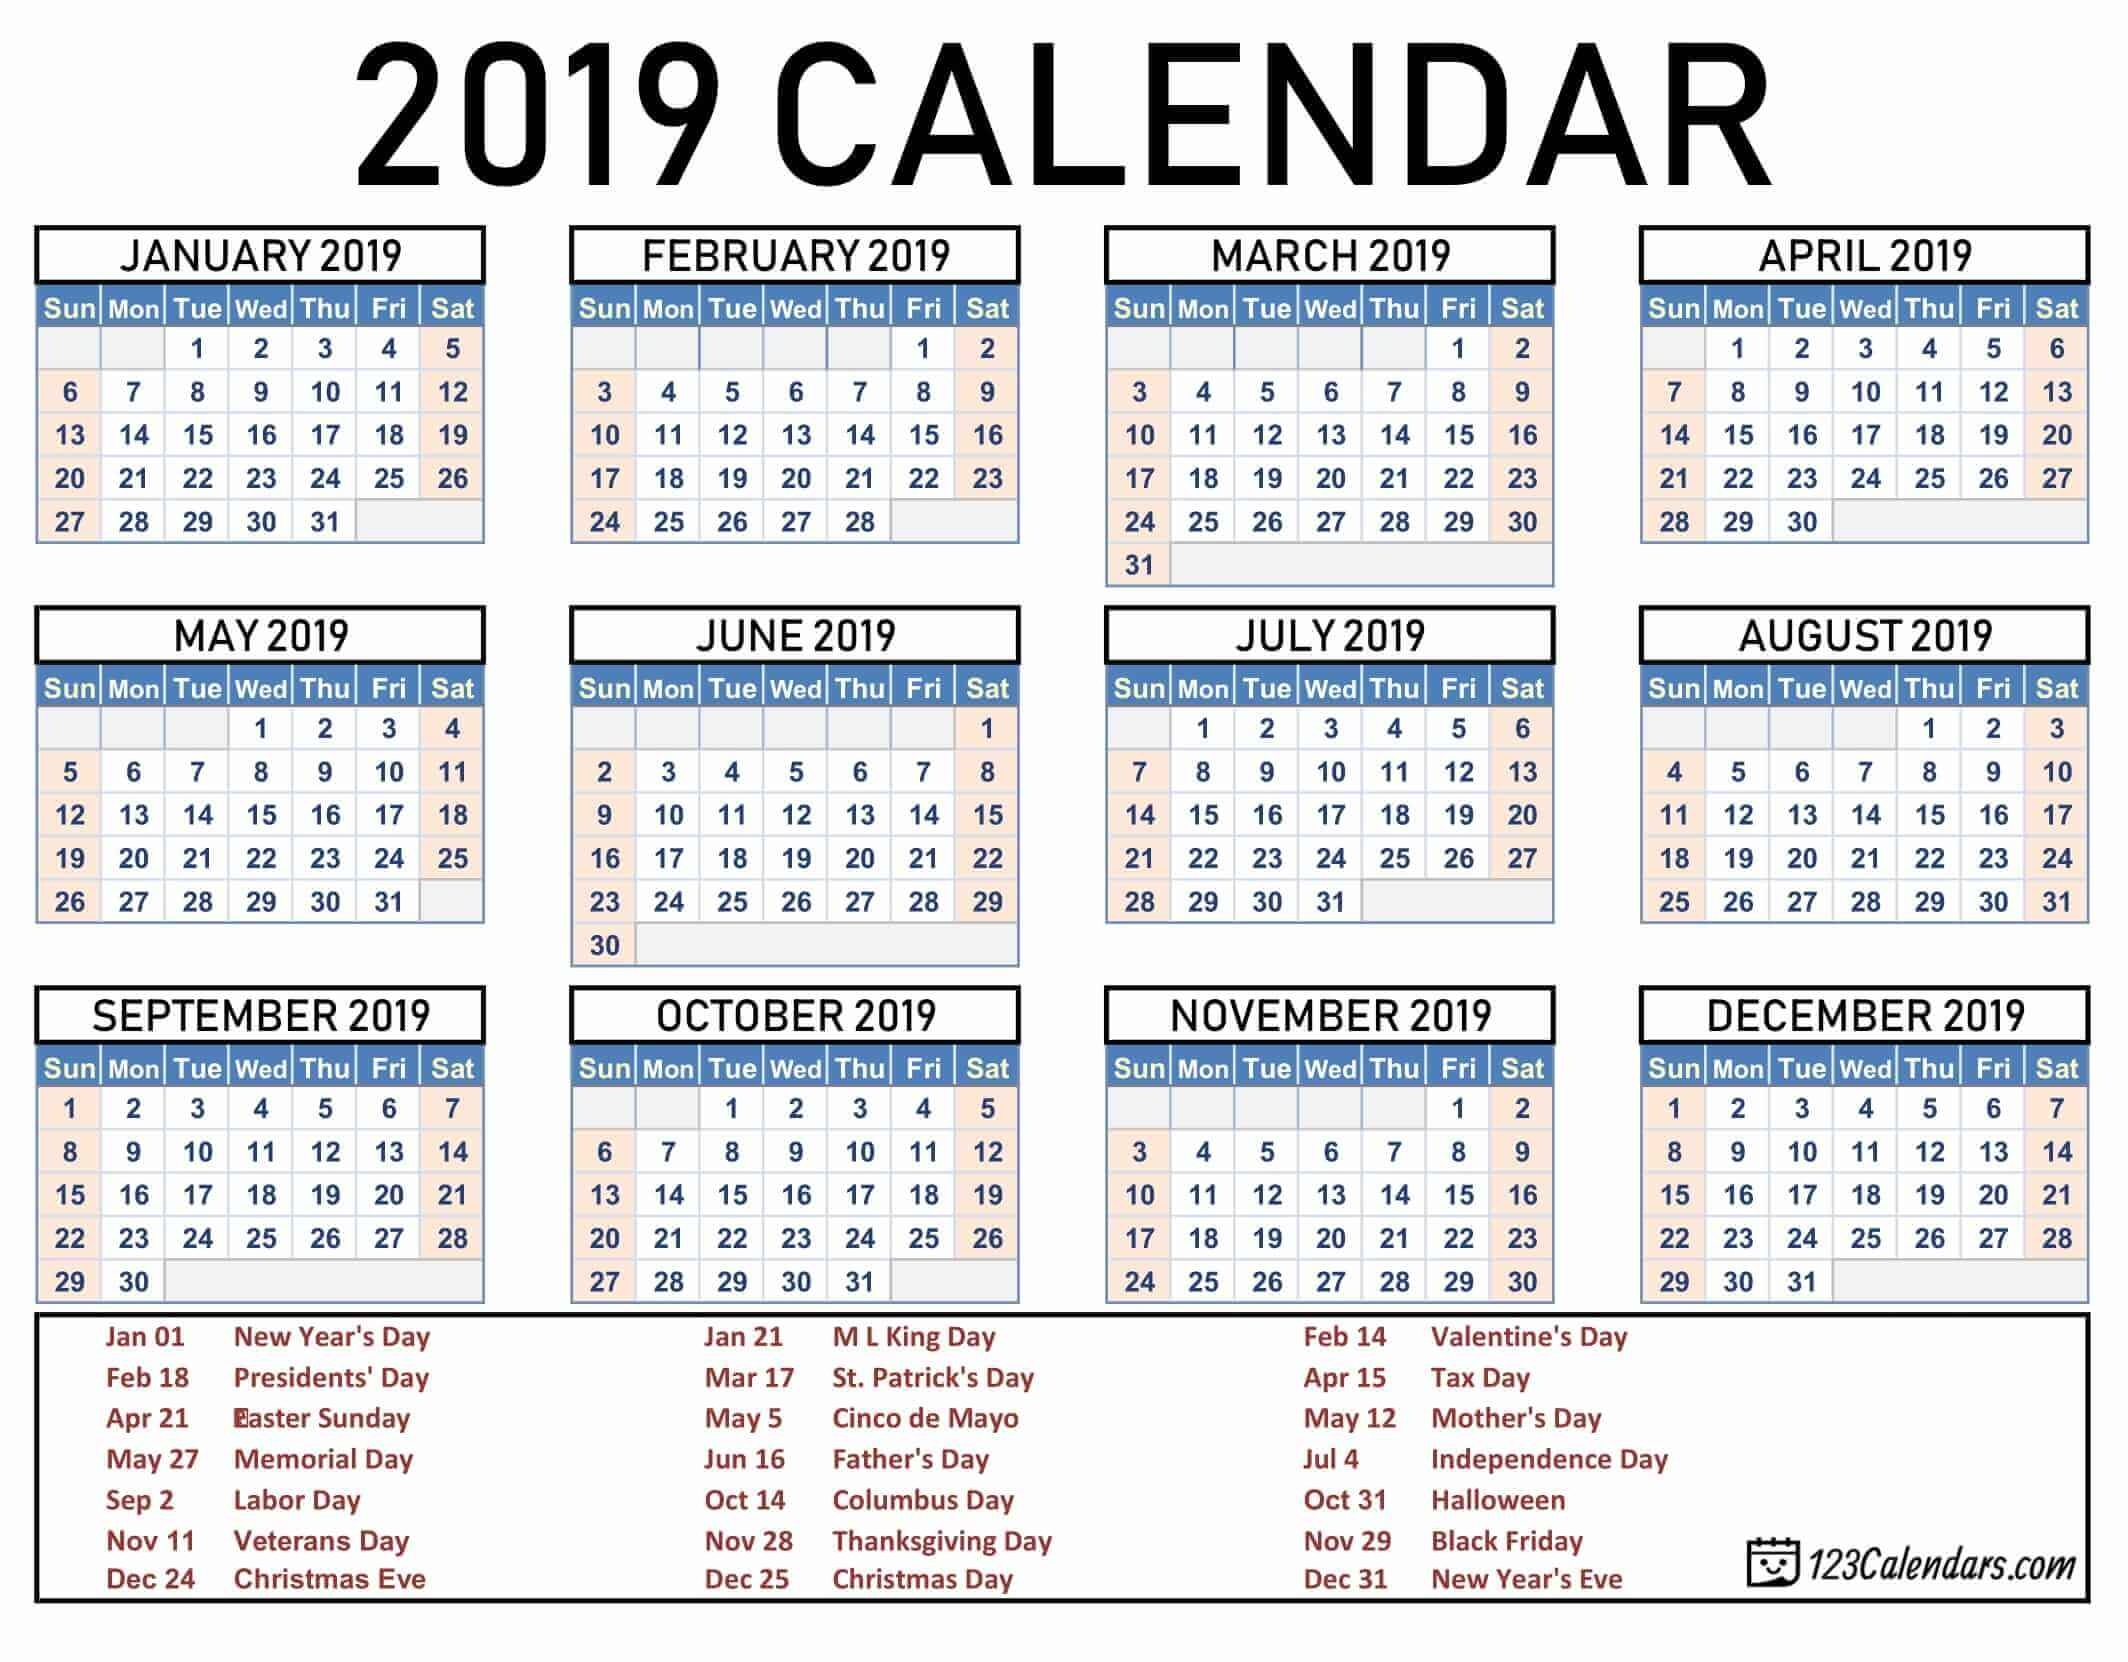 Lovely Printable Calendar For Year 2019 : Mini Calendar Template intended for Printable Calendars From 123Calendars